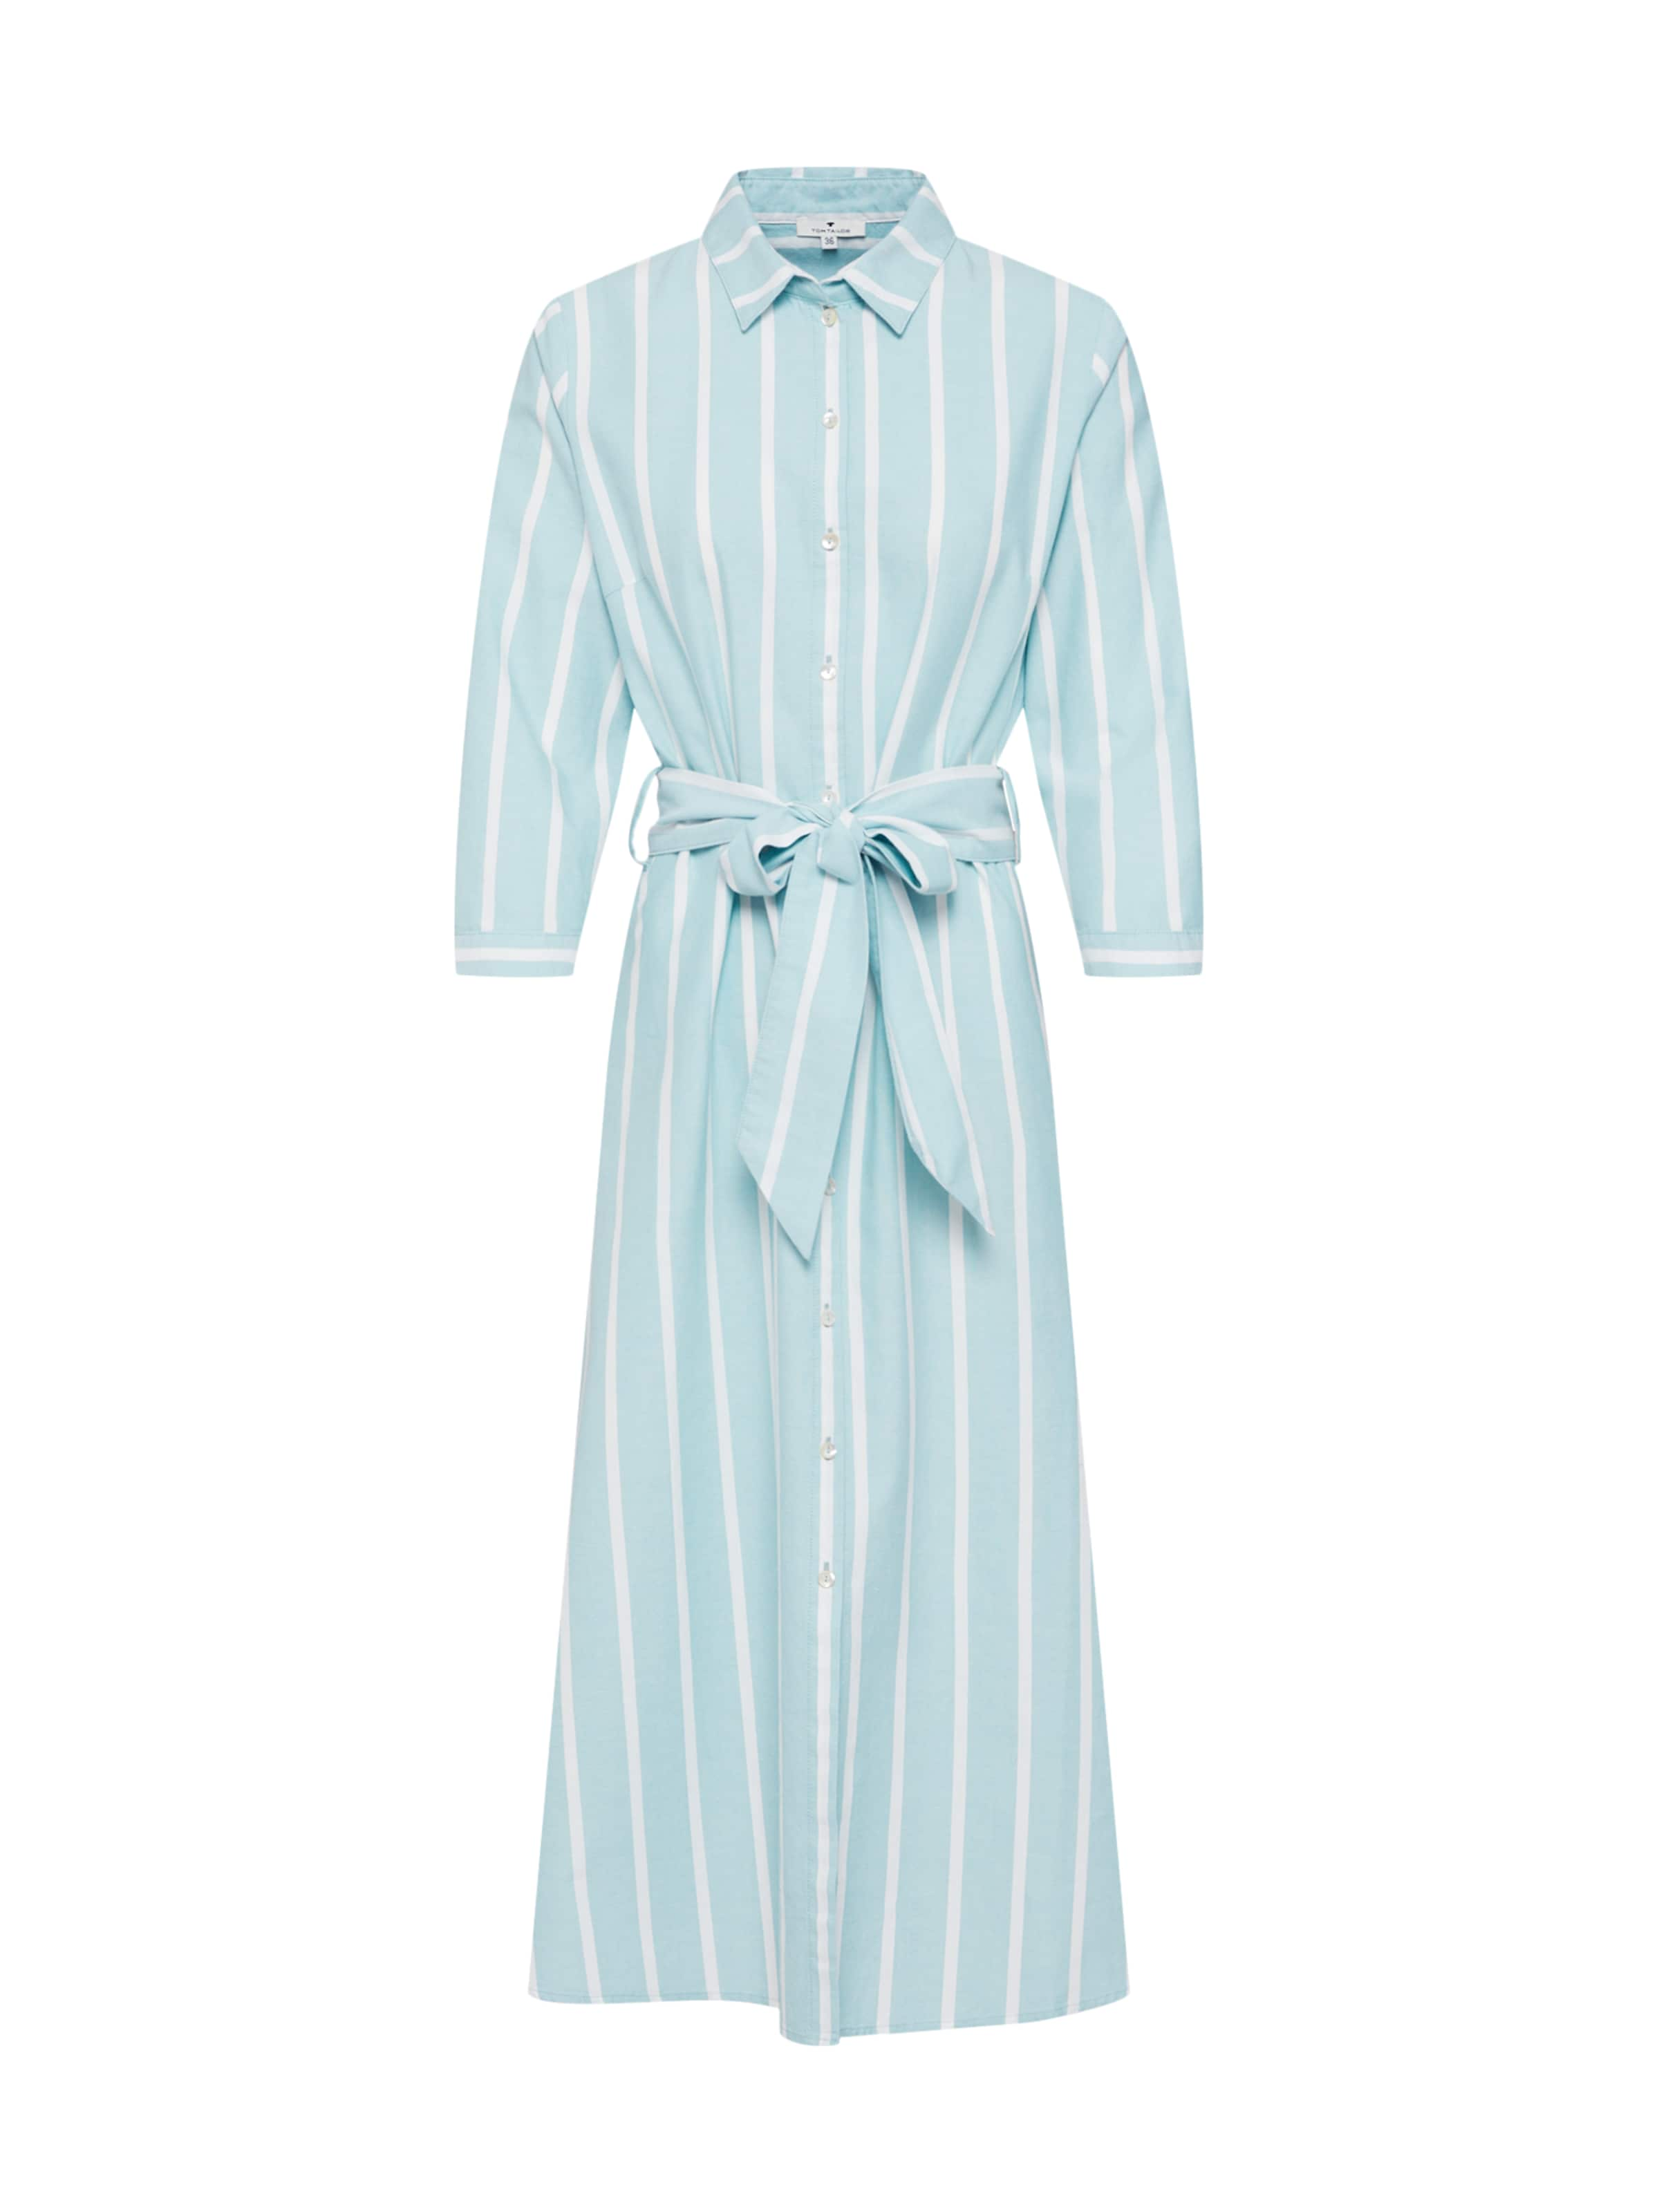 Robe chemise En MentheBlanc Tailor Tom nwkP8O0